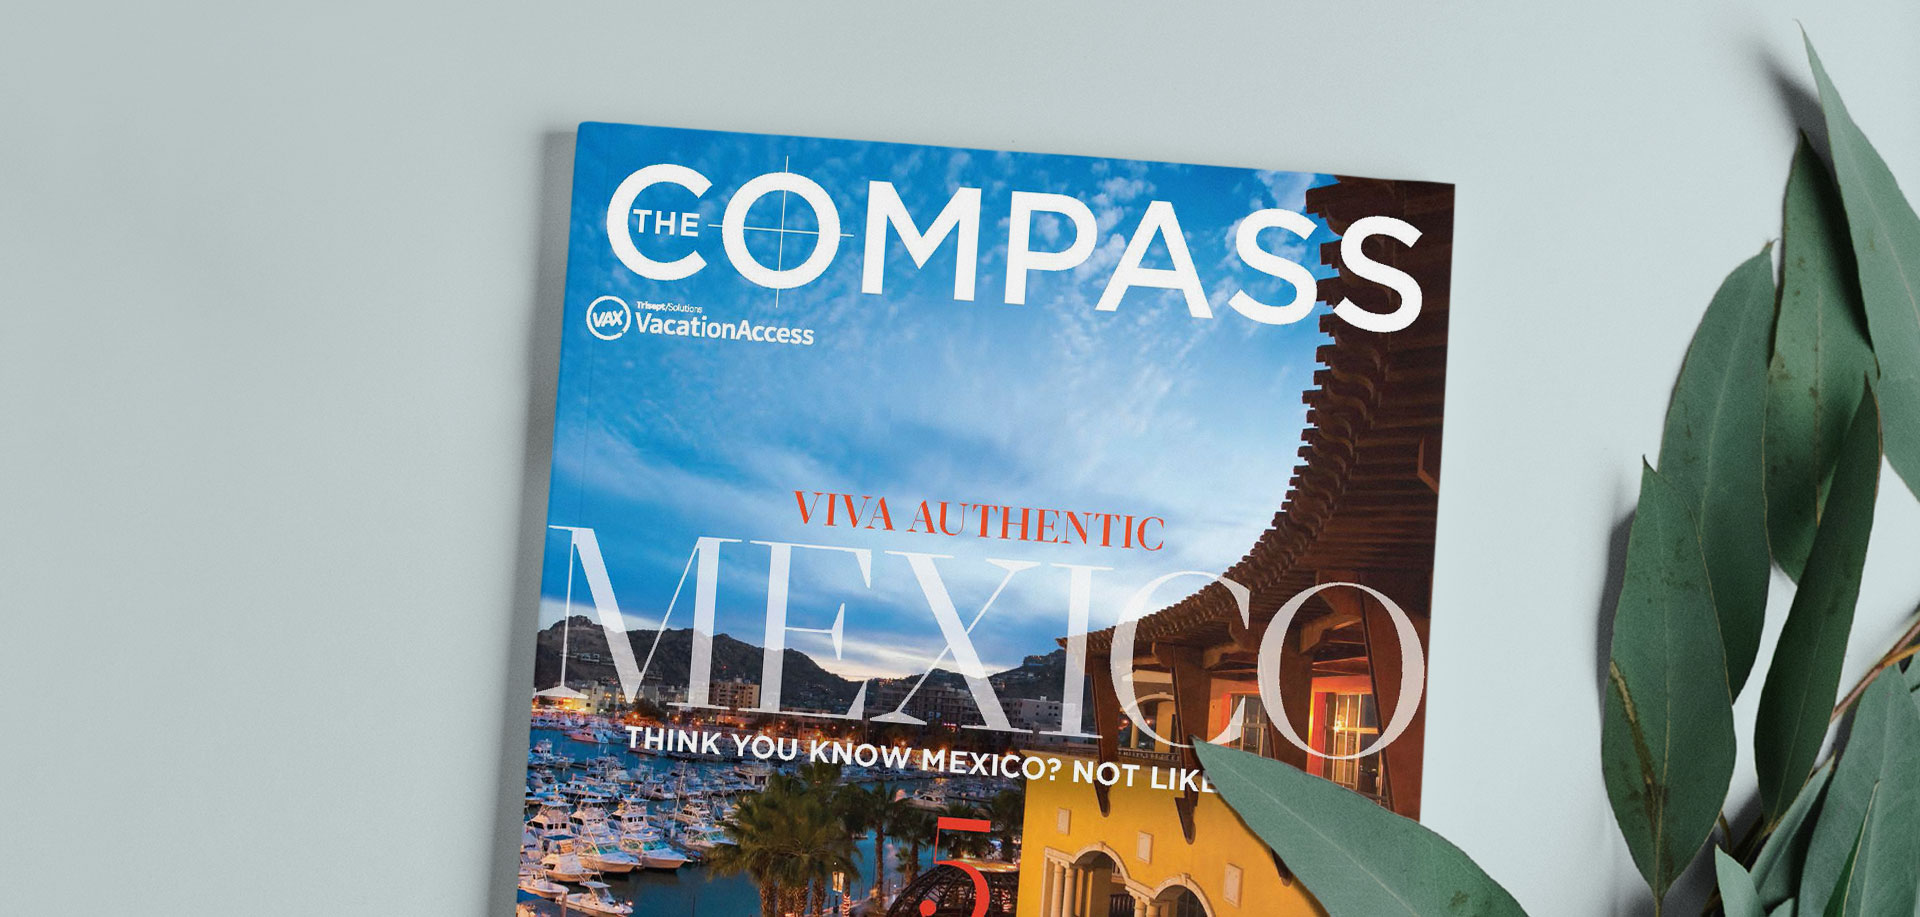 The Compass Magazine